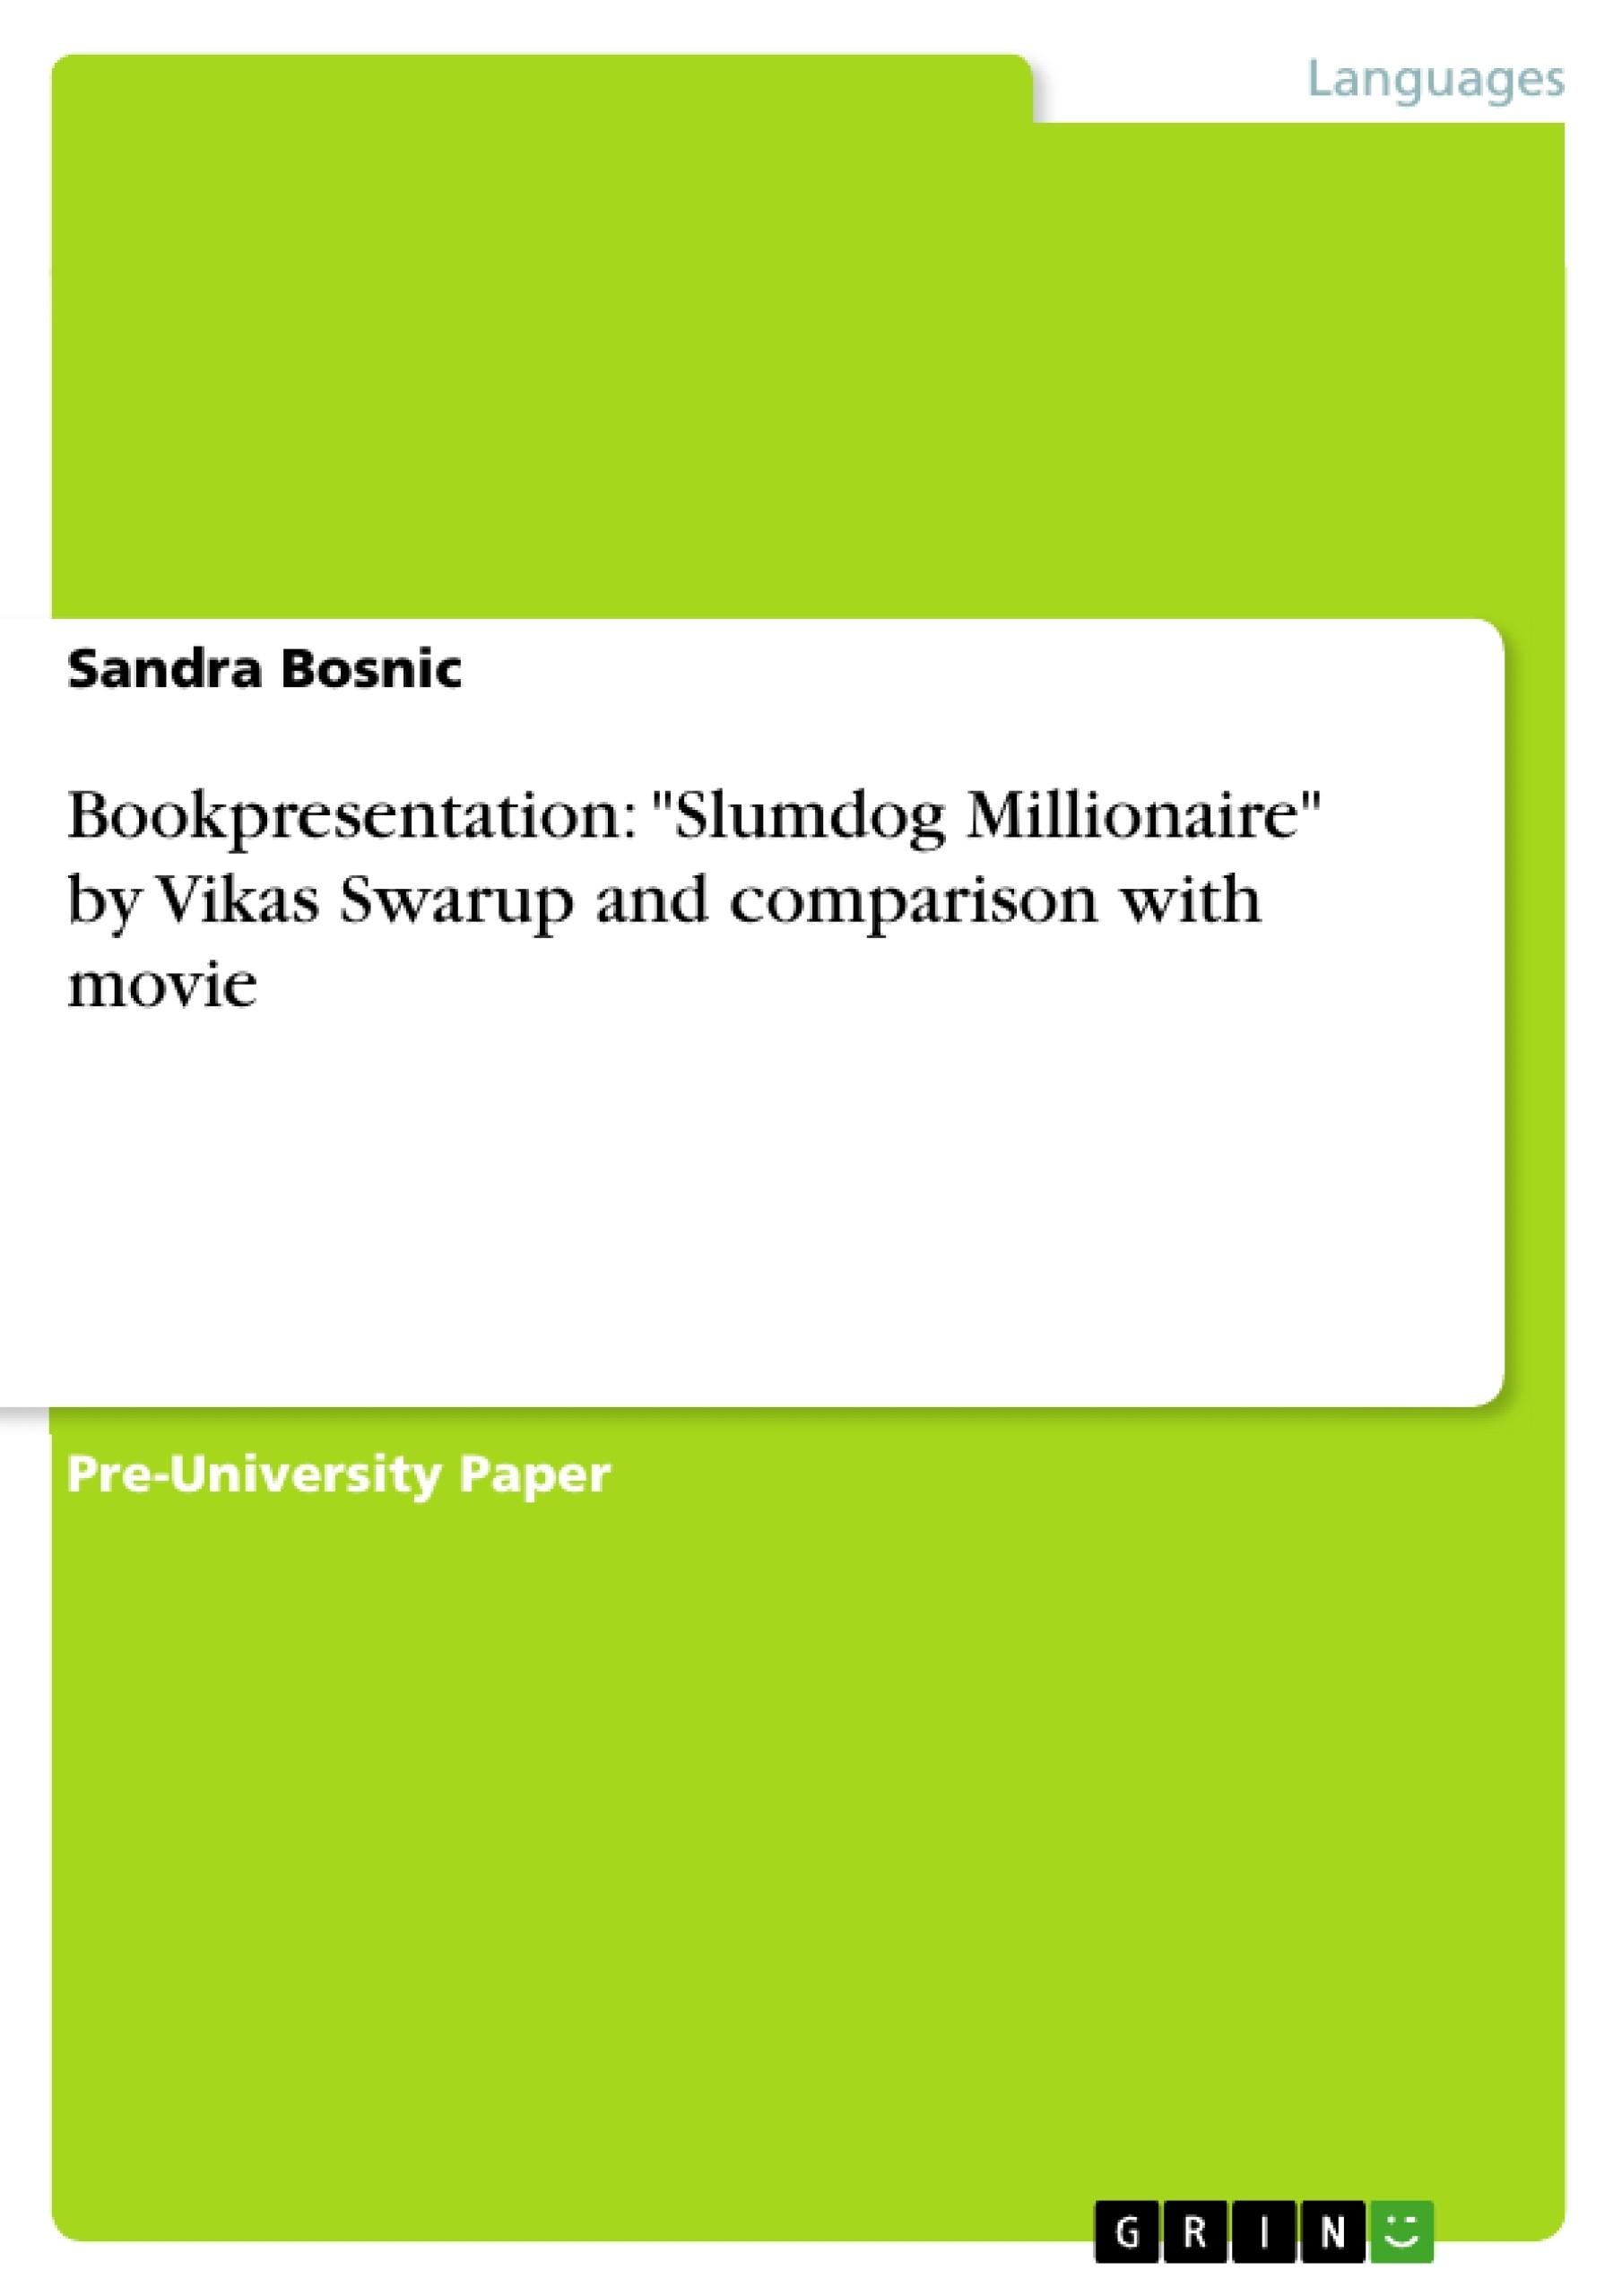 "Title: Bookpresentation: ""Slumdog Millionaire"" by Vikas Swarup and comparison with movie"